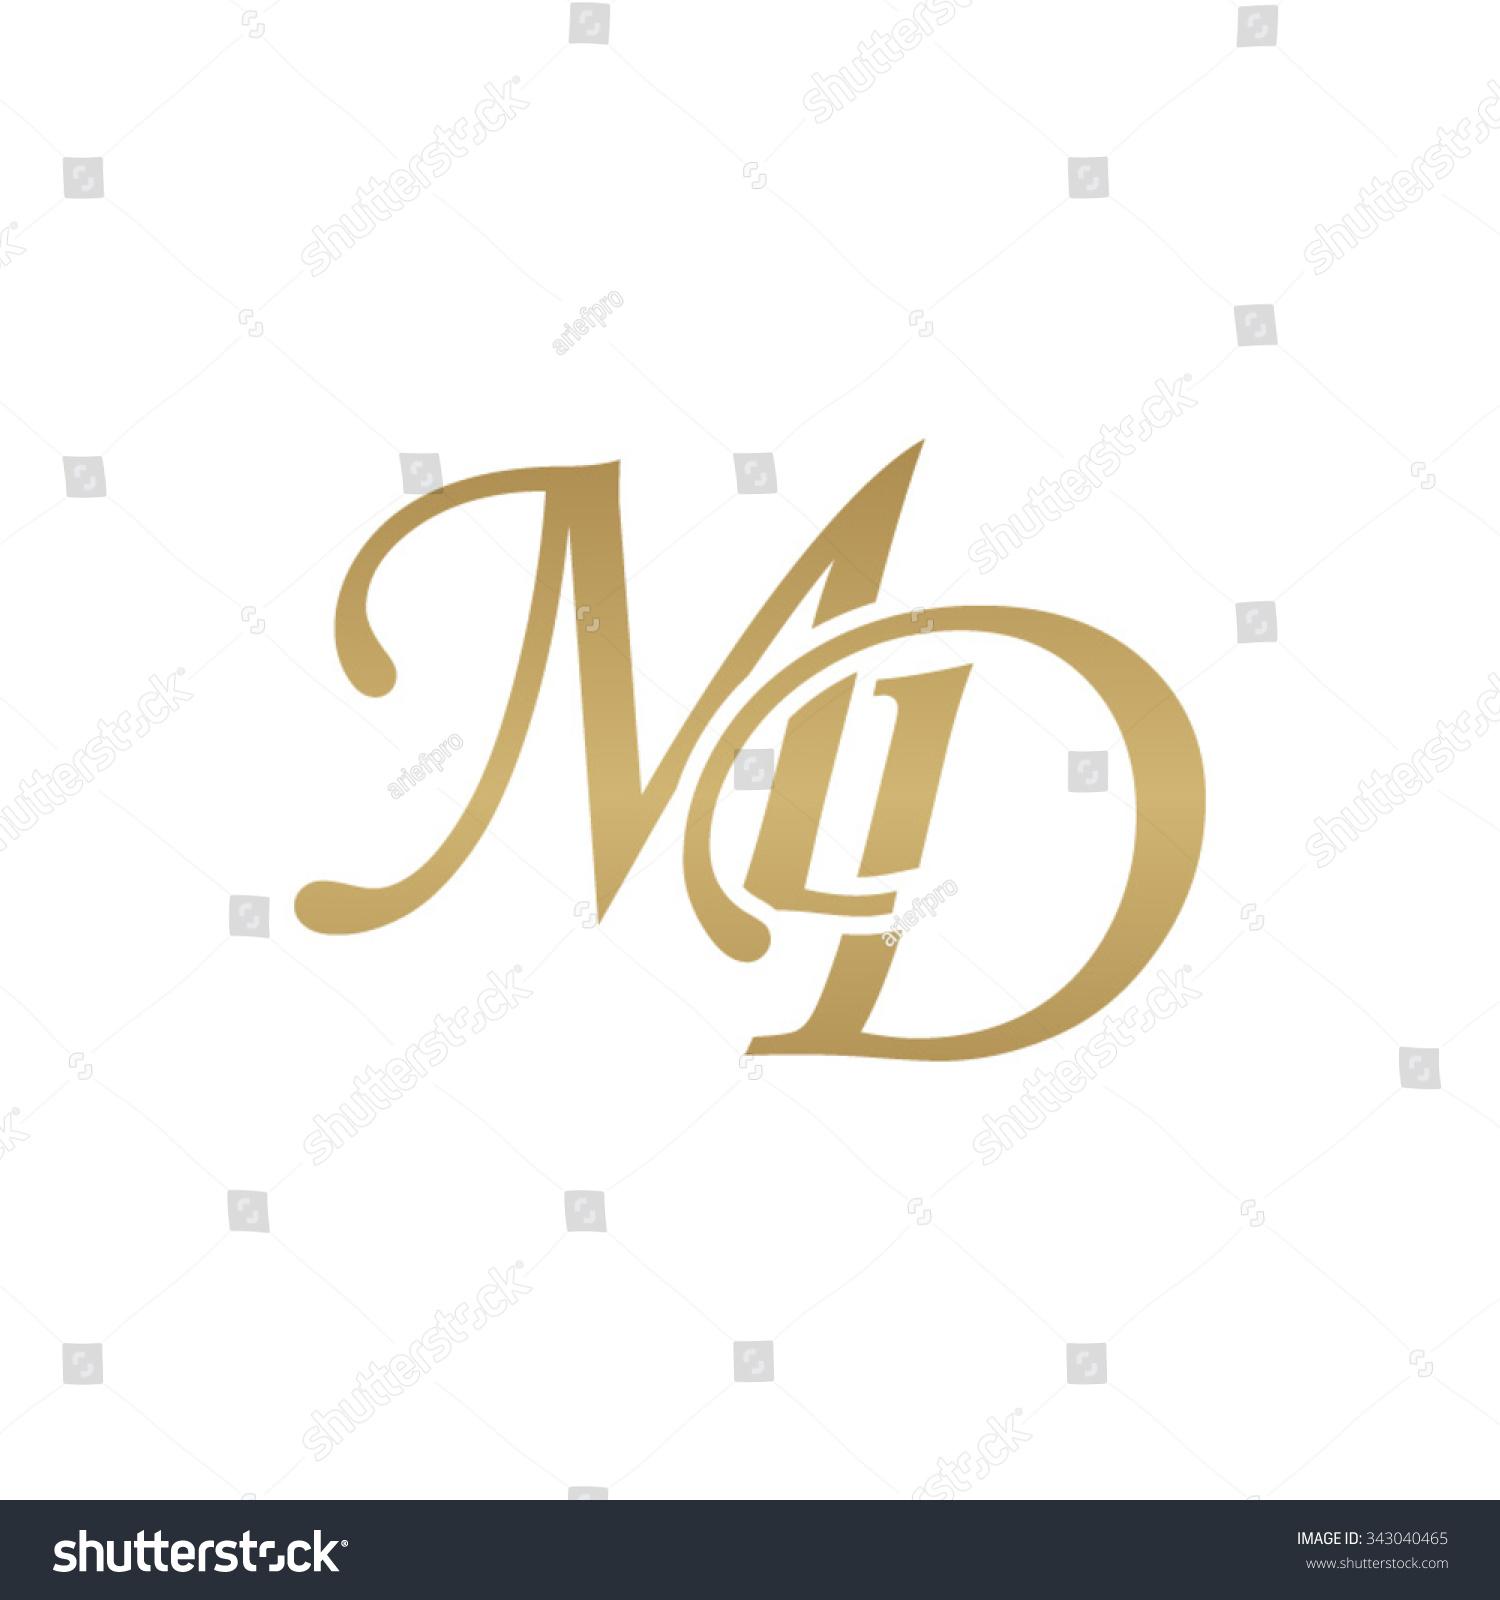 md initial monogram logo stock vector 343040465 shutterstock. Black Bedroom Furniture Sets. Home Design Ideas